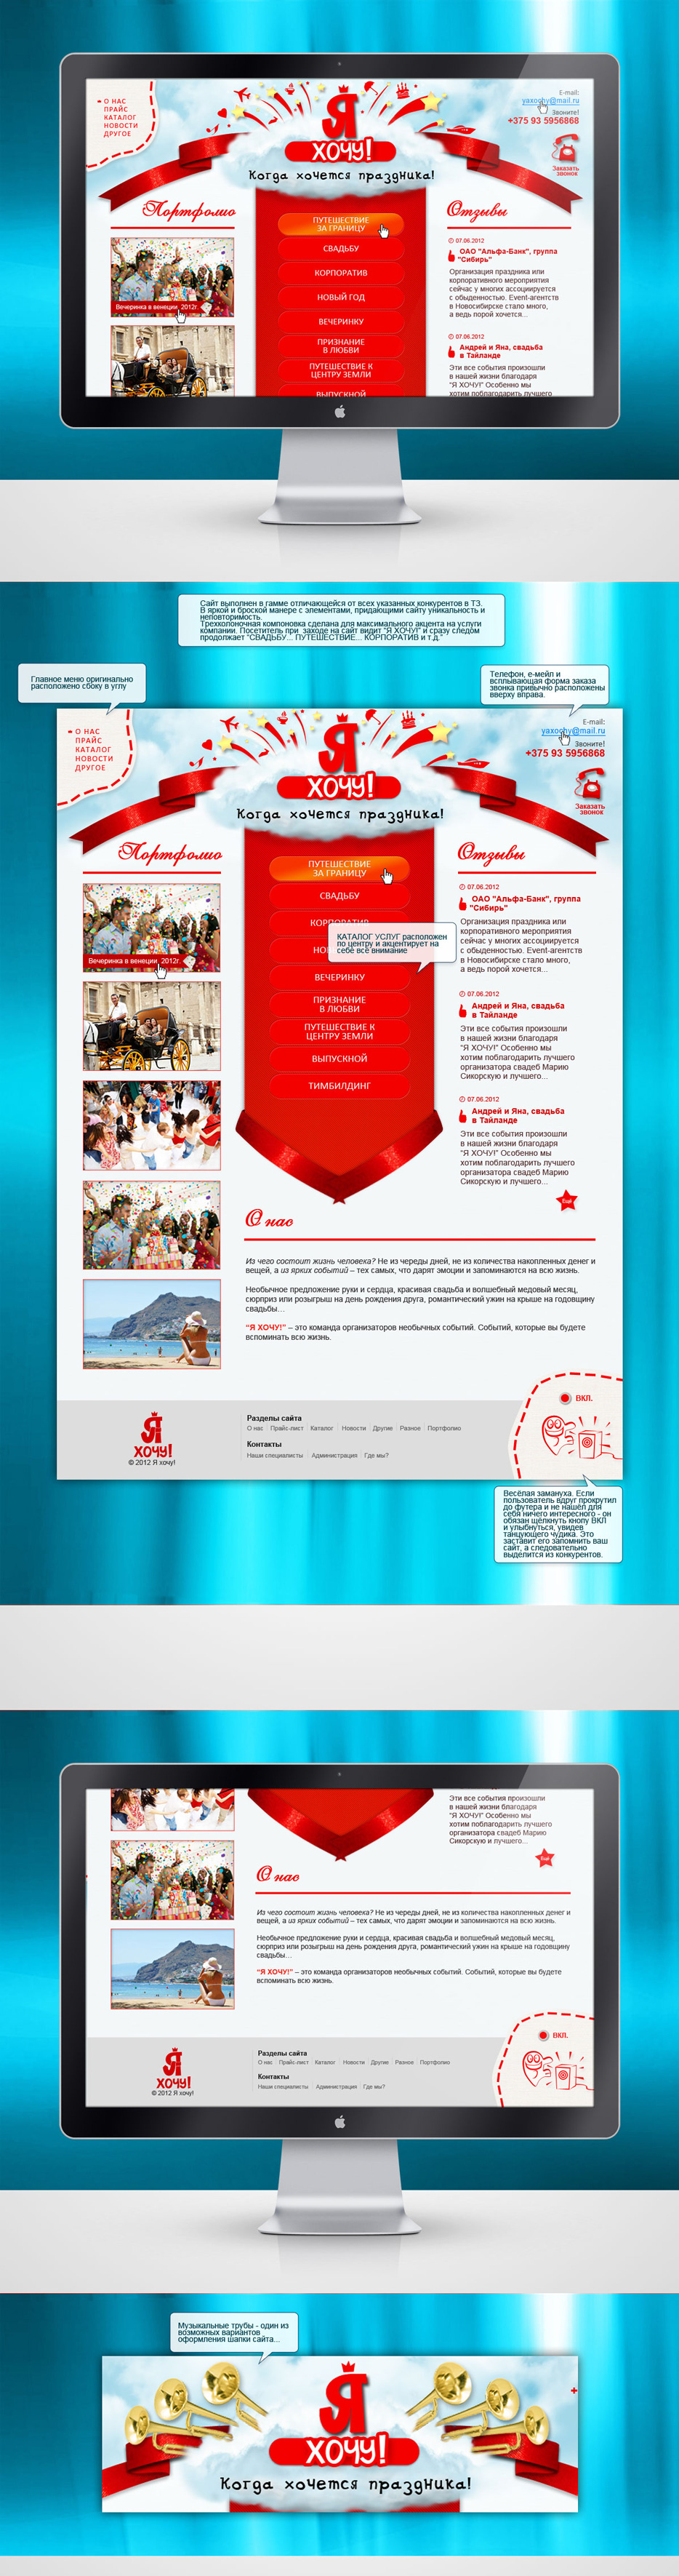 Сайт агентства по исполнению желаний